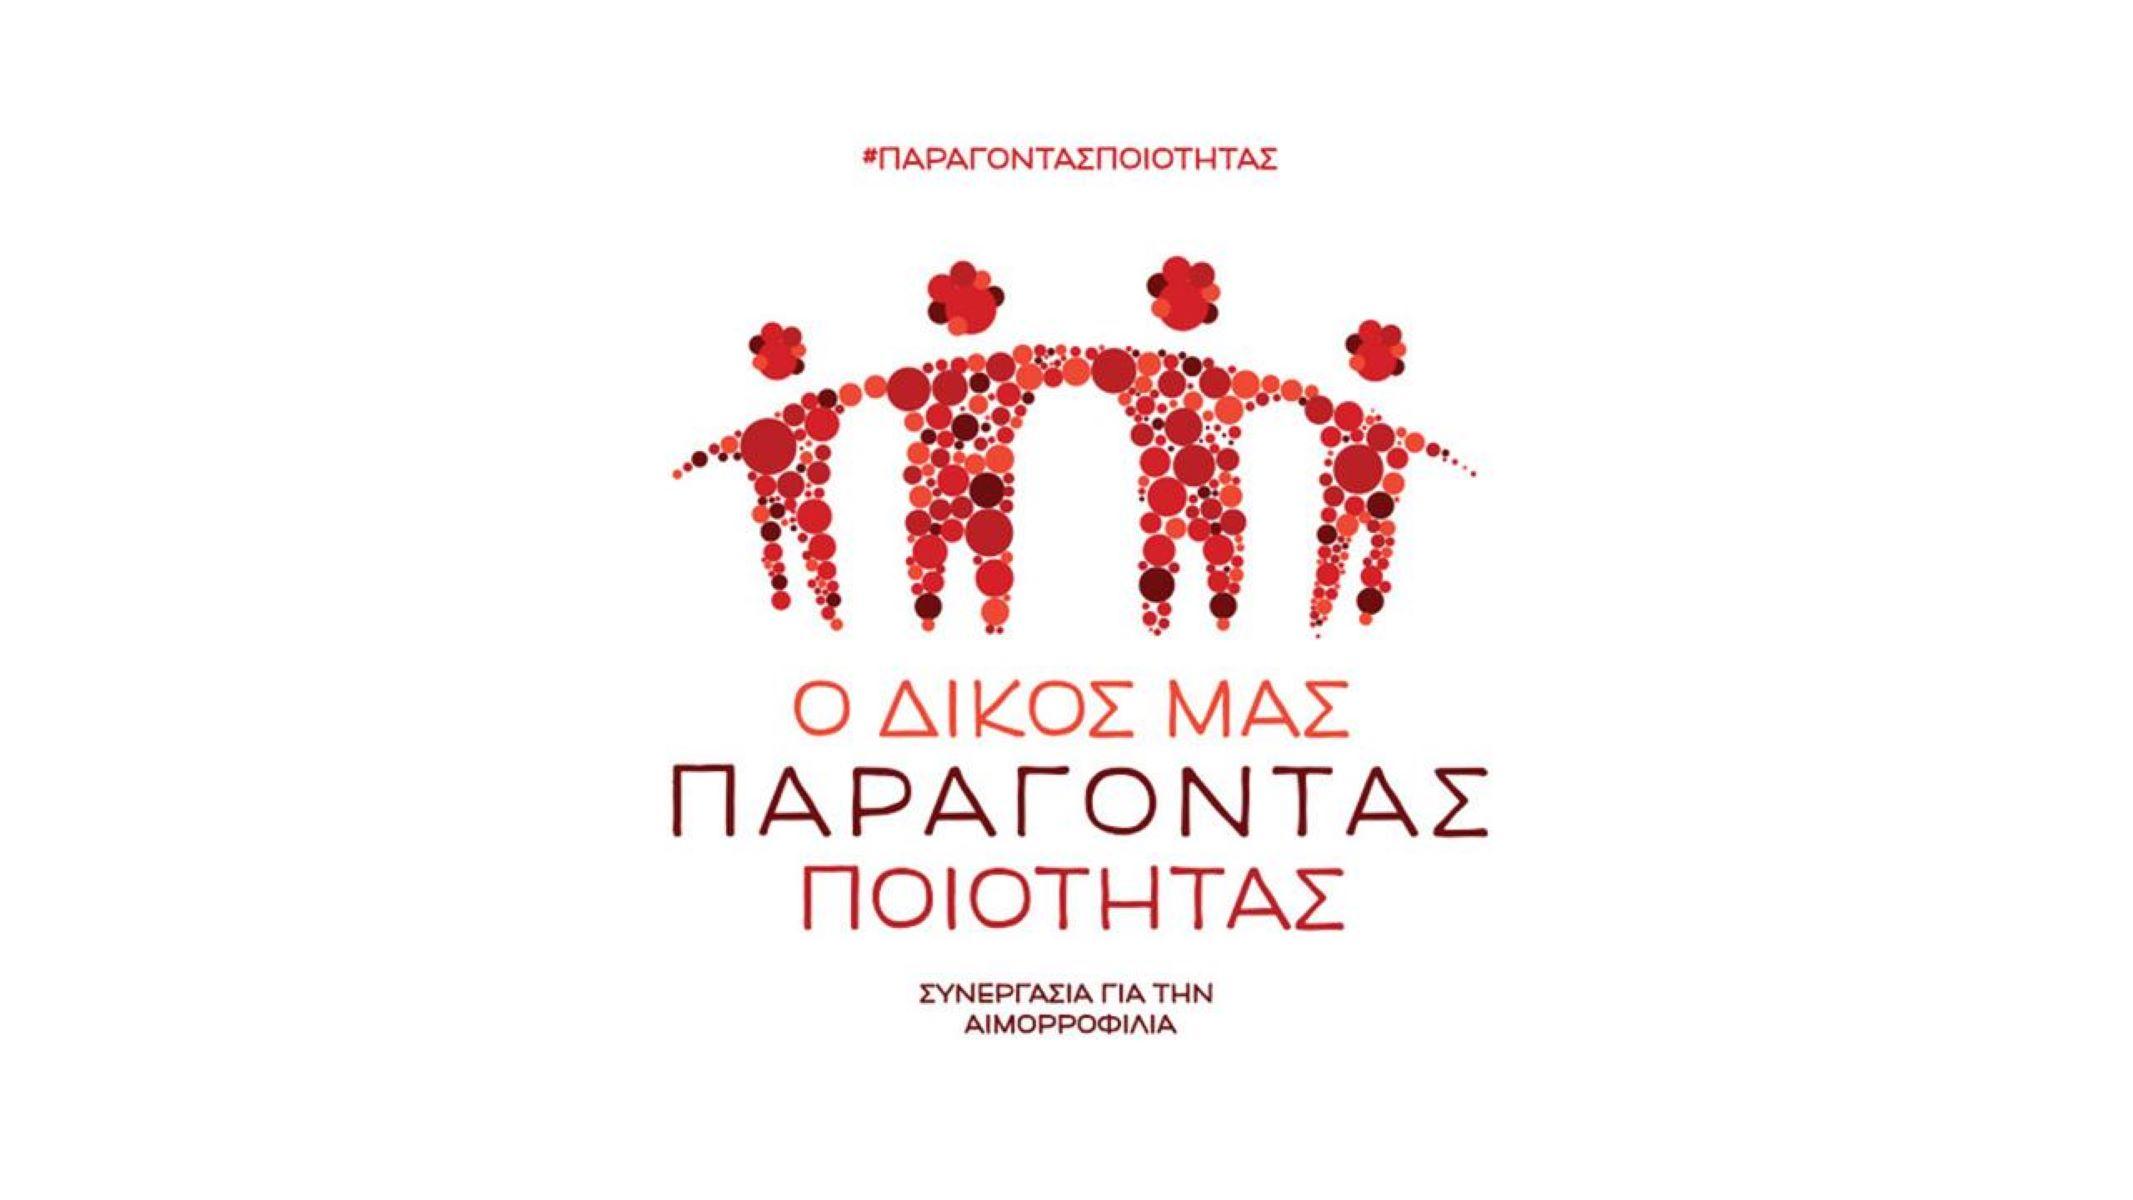 Aιμορροφιλία: Πανελλαδική εκστρατεία από τον Σύλλογο Προστασίας των Ελλήνων Αιμορροφιλικών